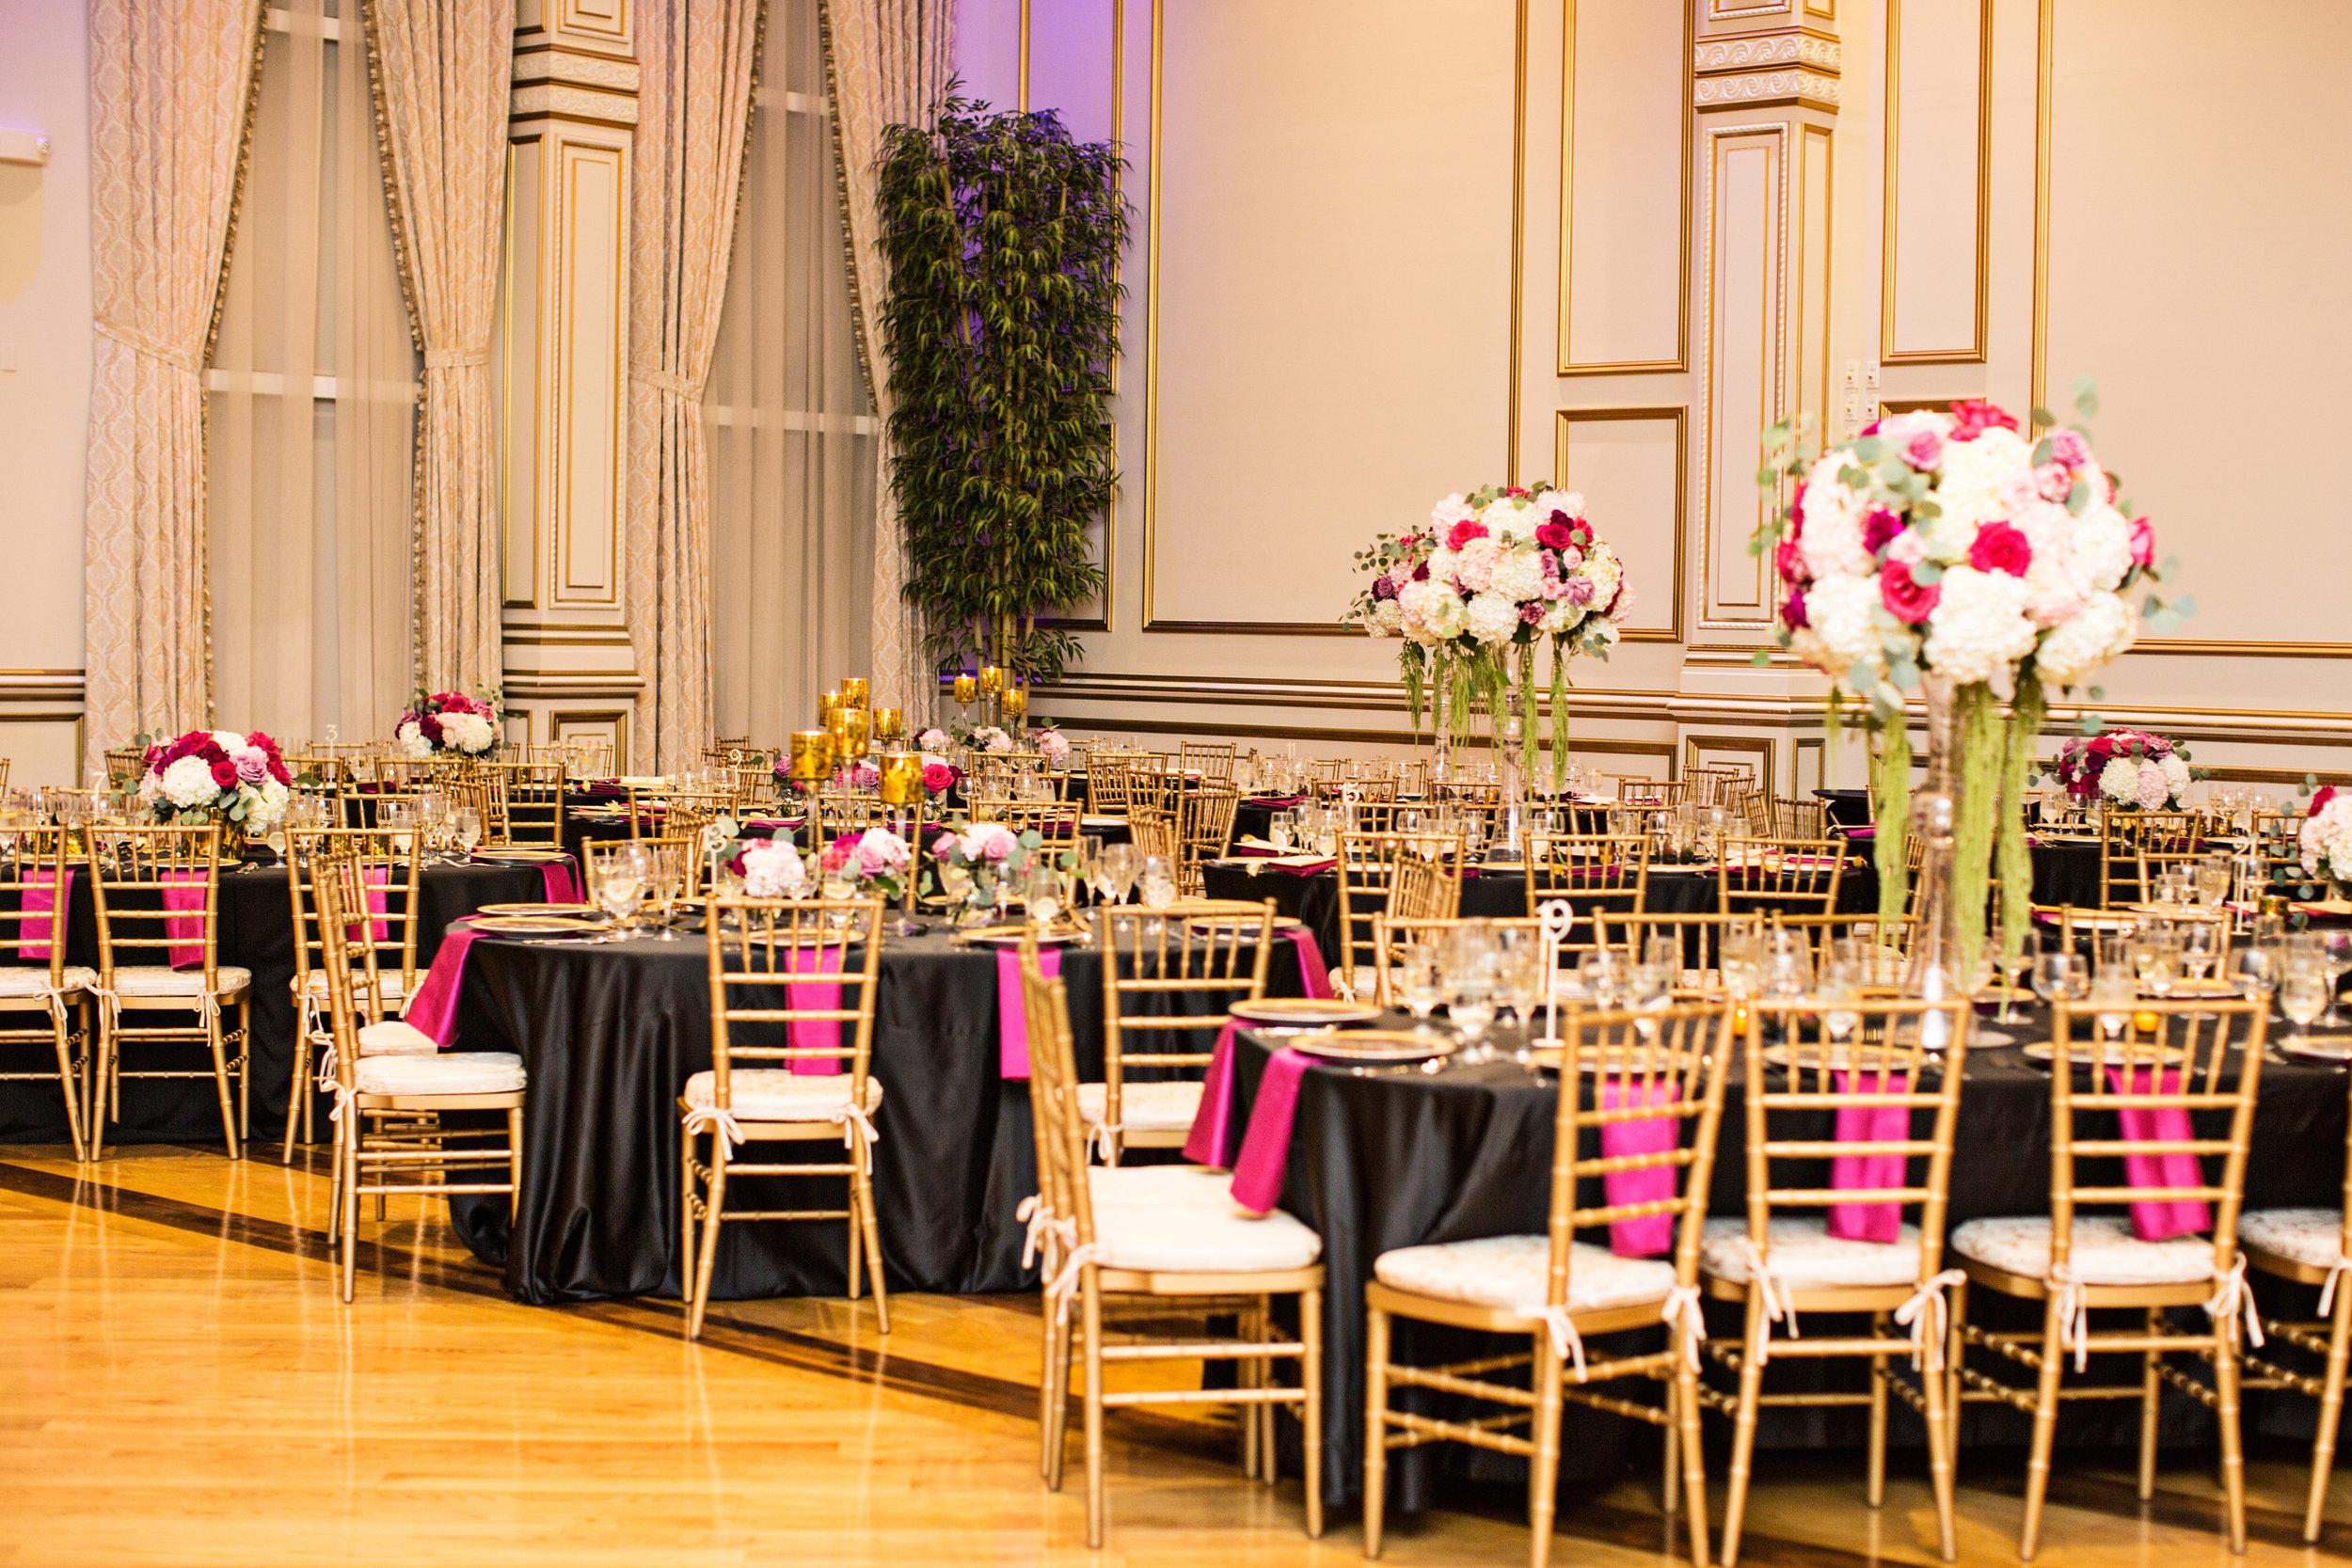 victorious-events-nyc-023-romie-kamali-tides-estate-wedding-nana-annan.jpg